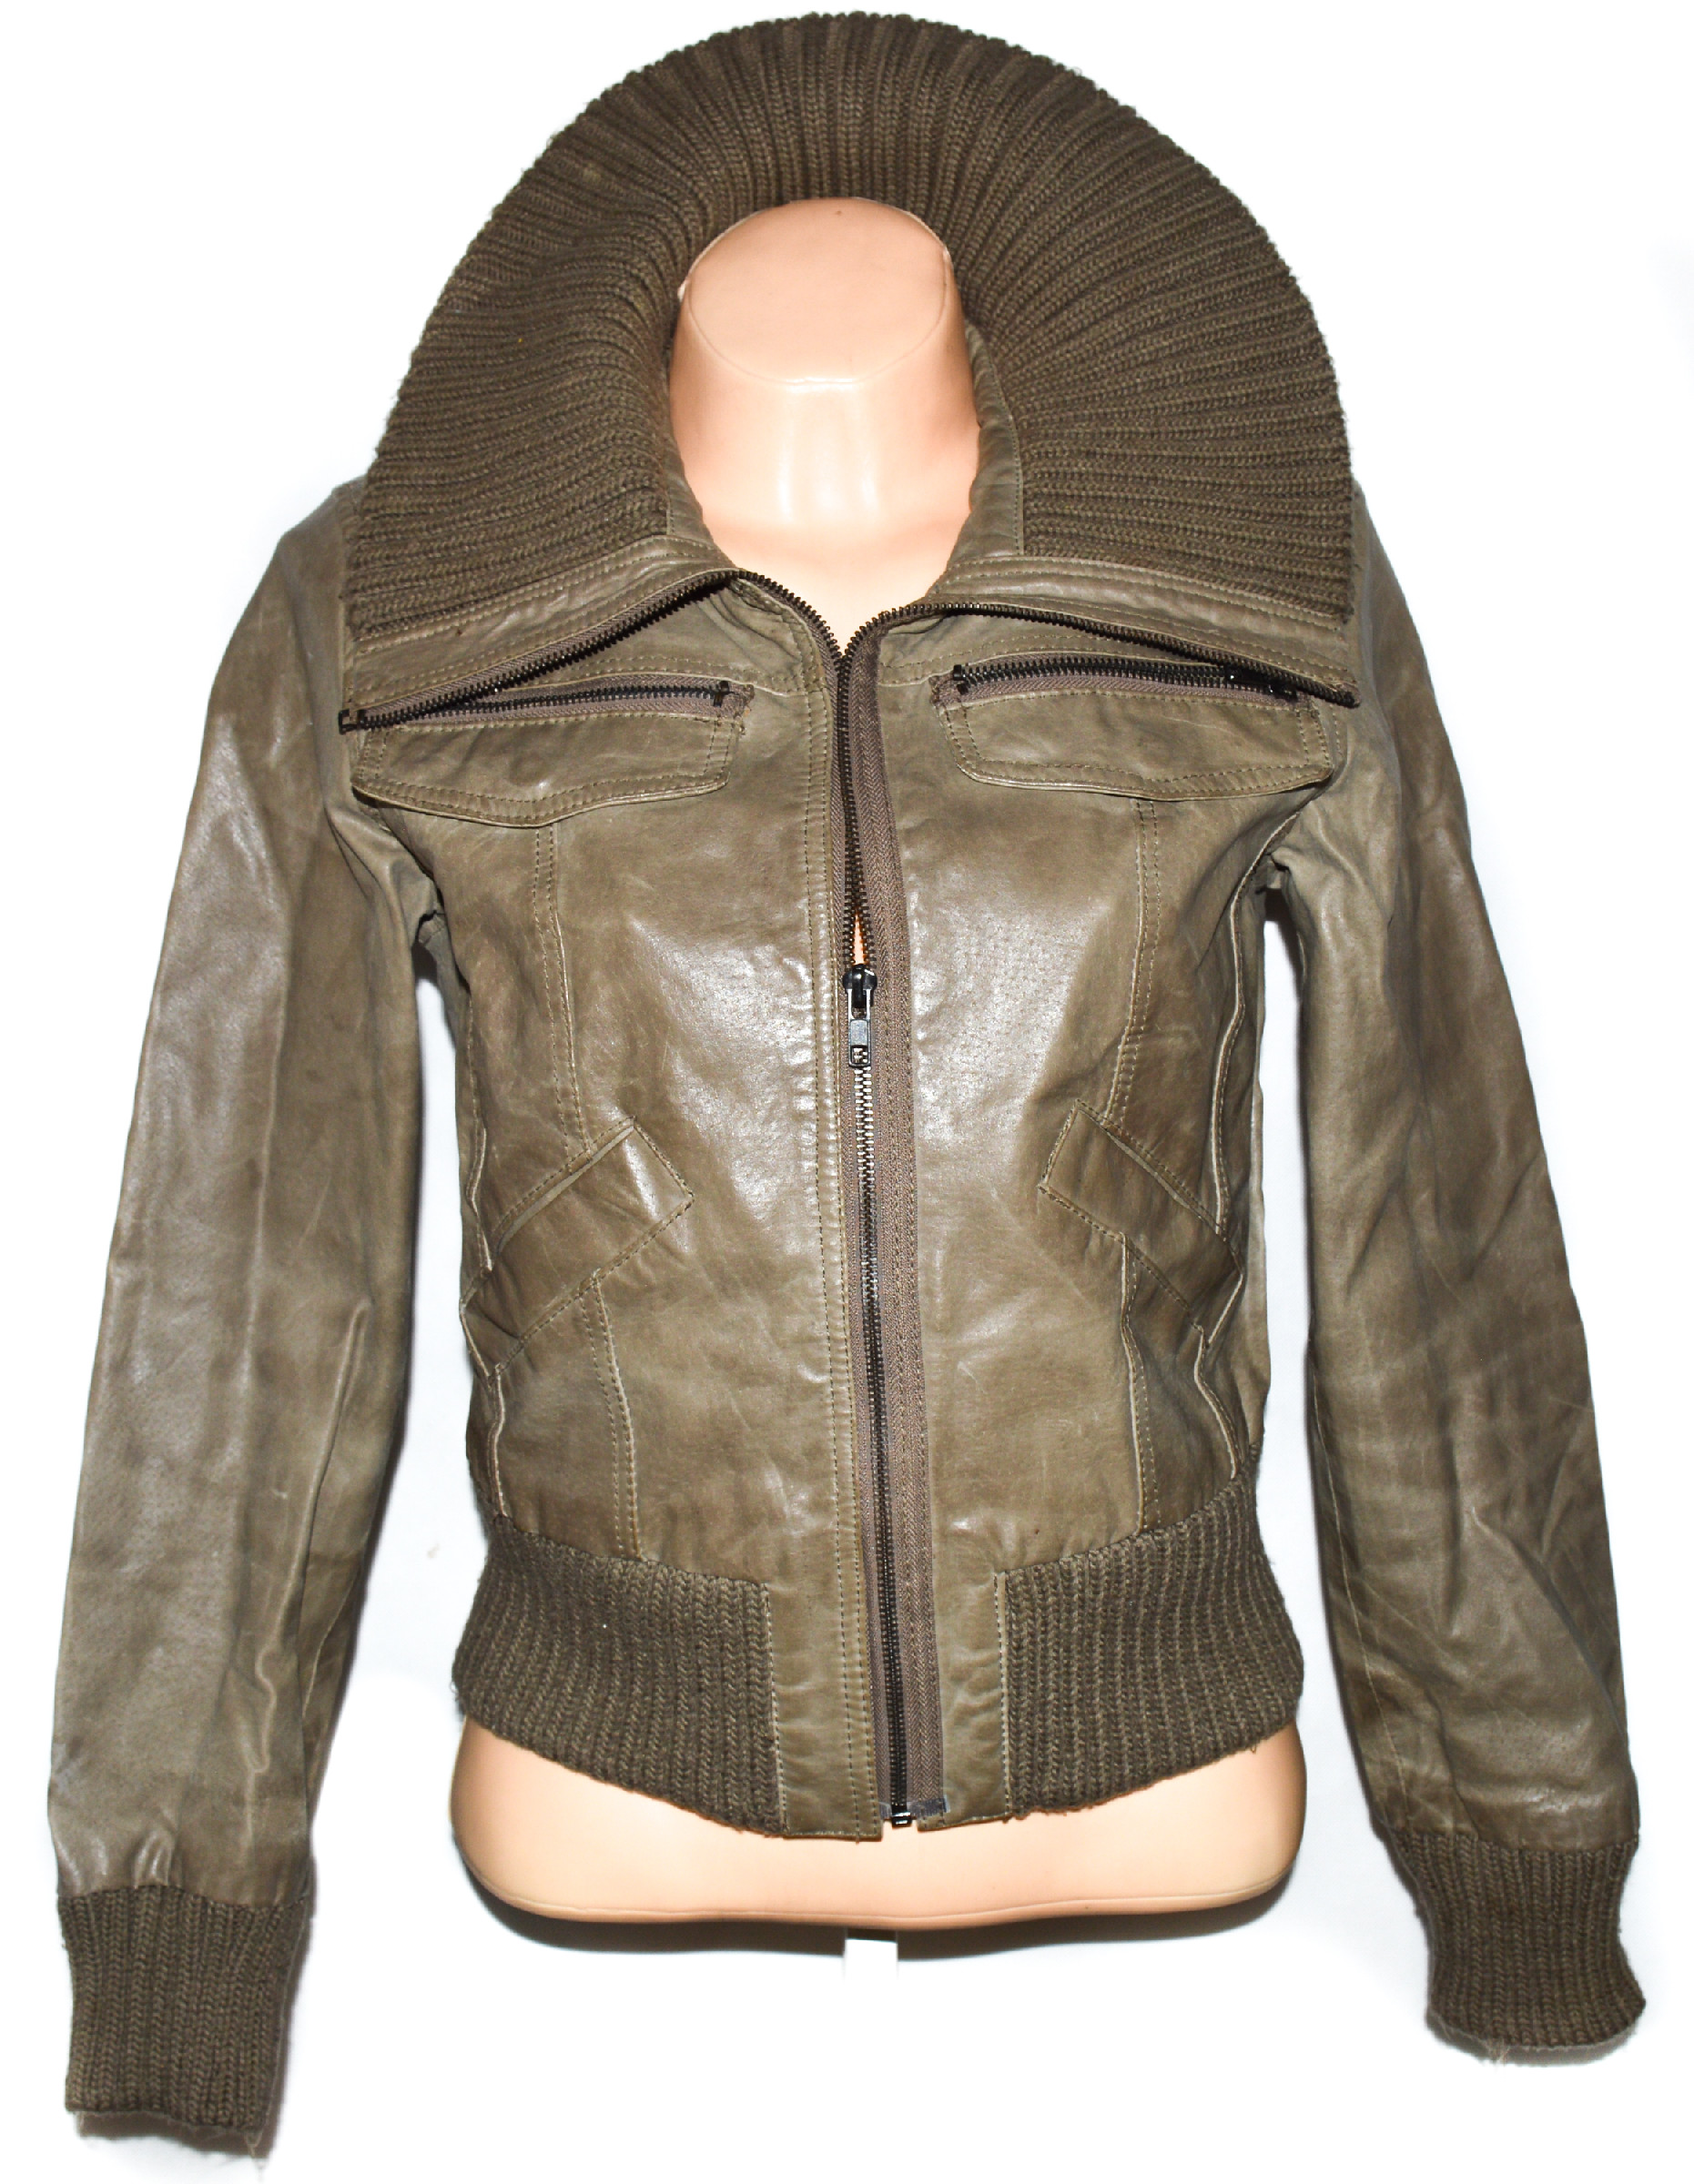 KOŽENÁ dámská hnědá bunda na zip NEW LOOK L